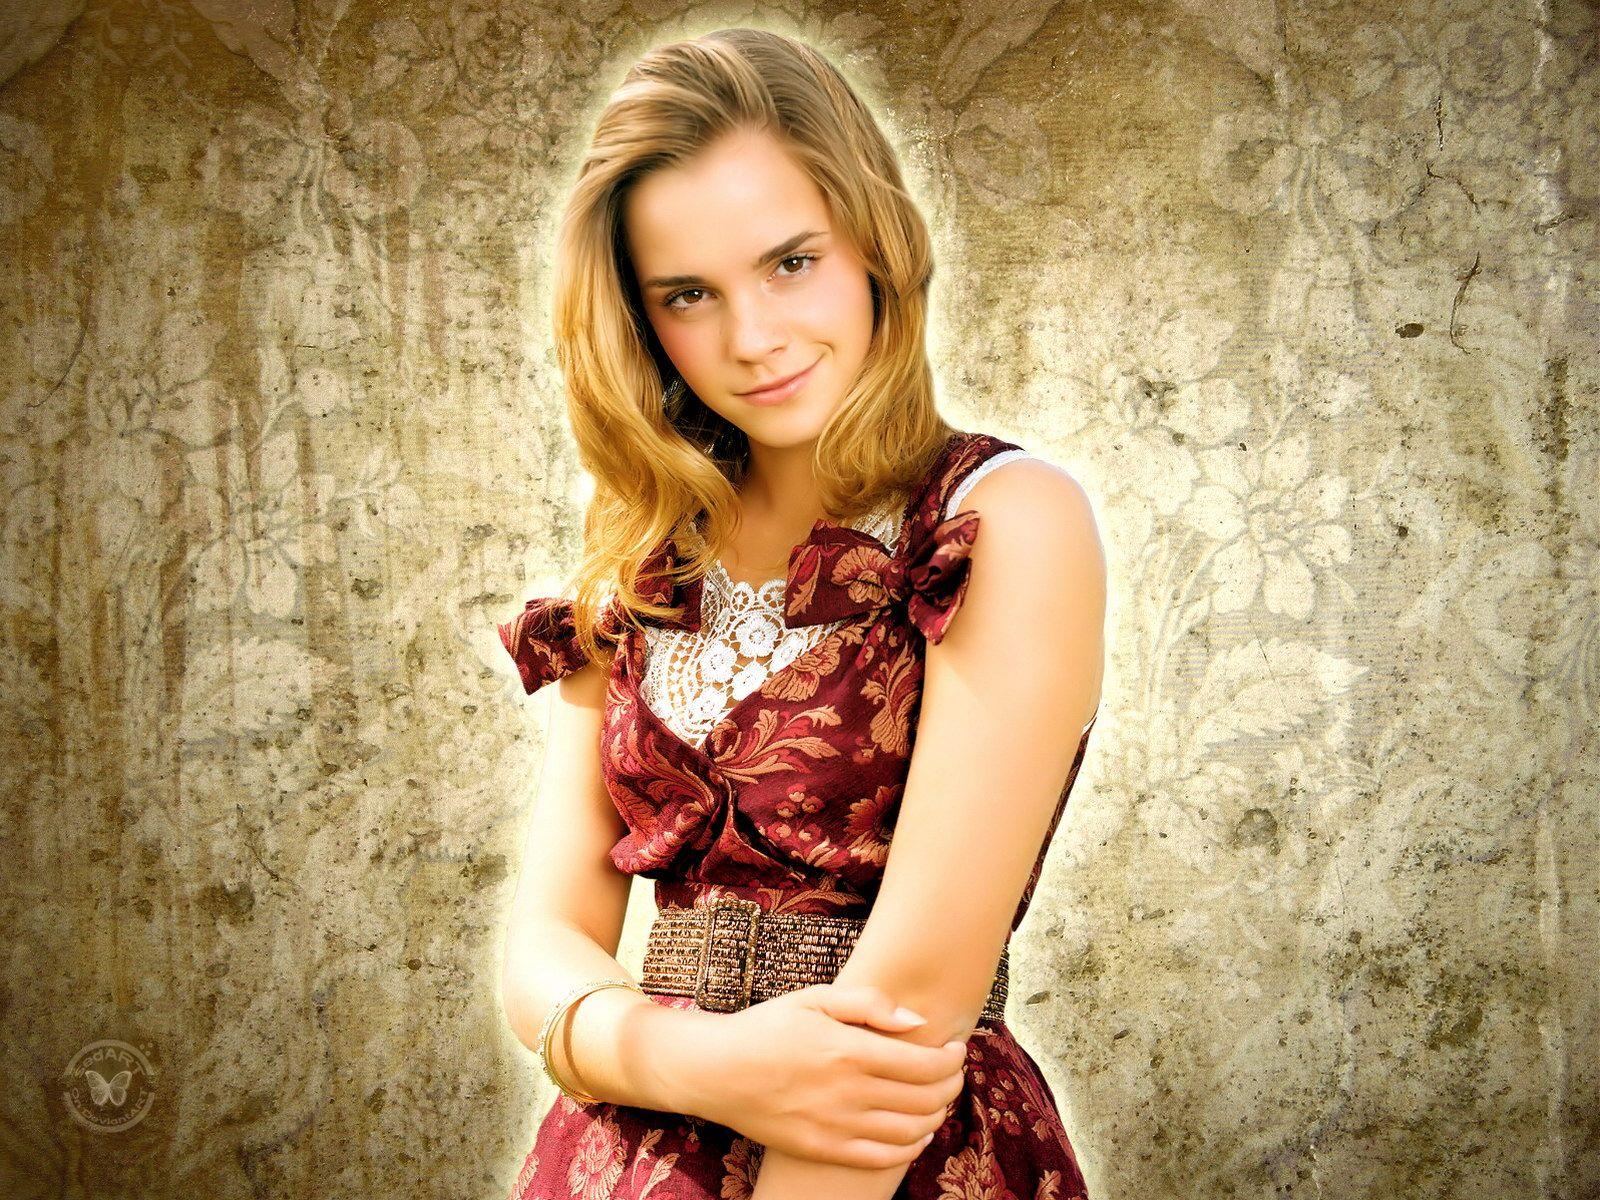 Hollywood: Emma Watson HD Wallpapers 2012